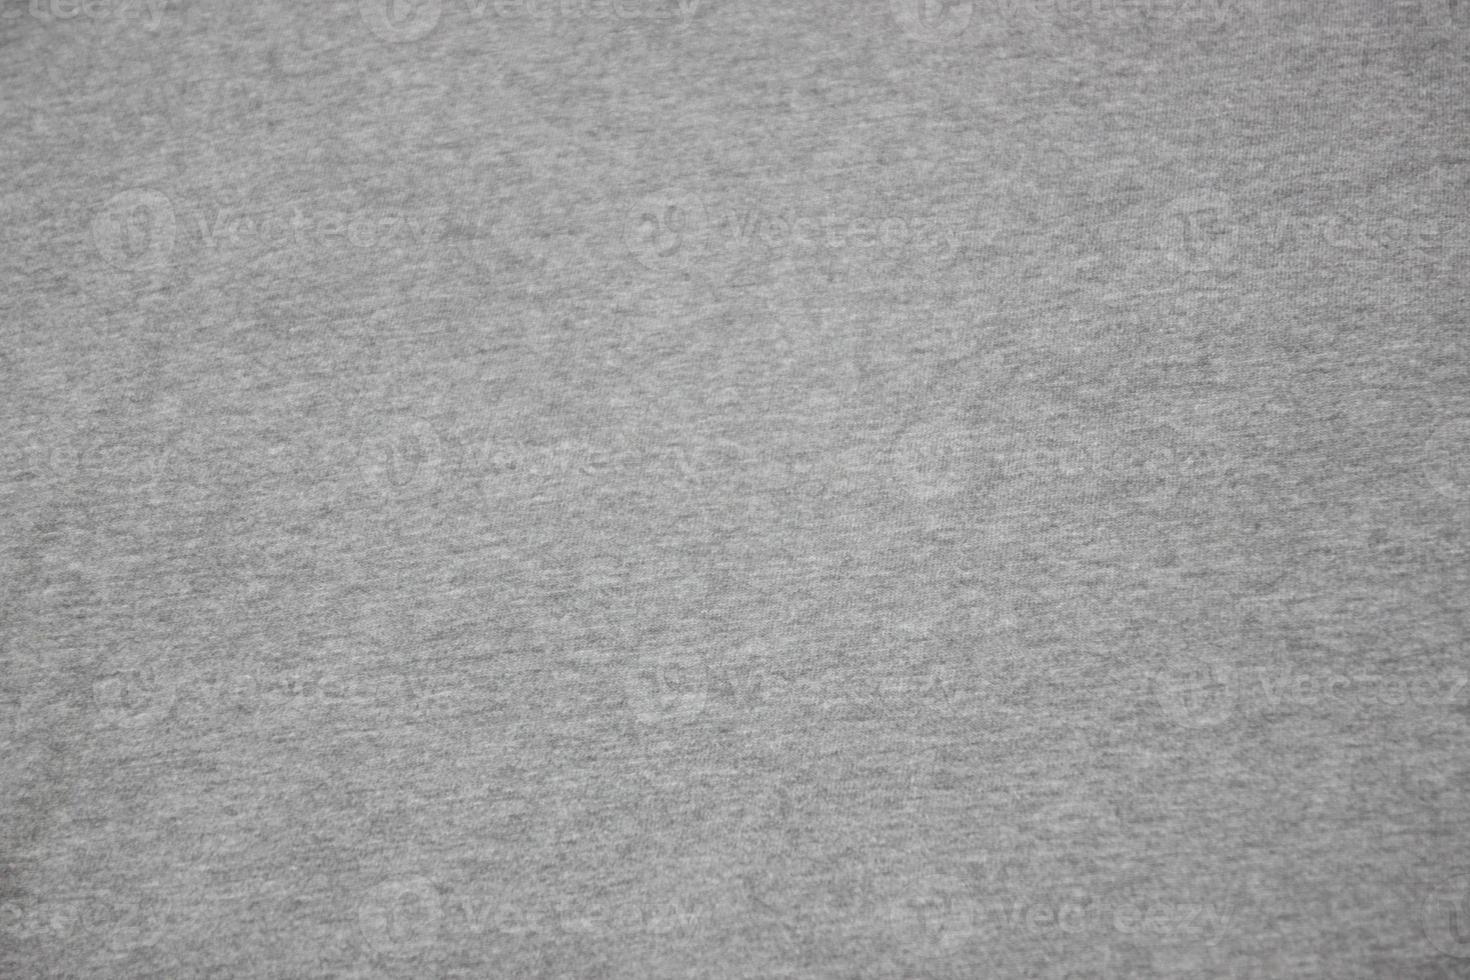 Grey fabric texture. photo